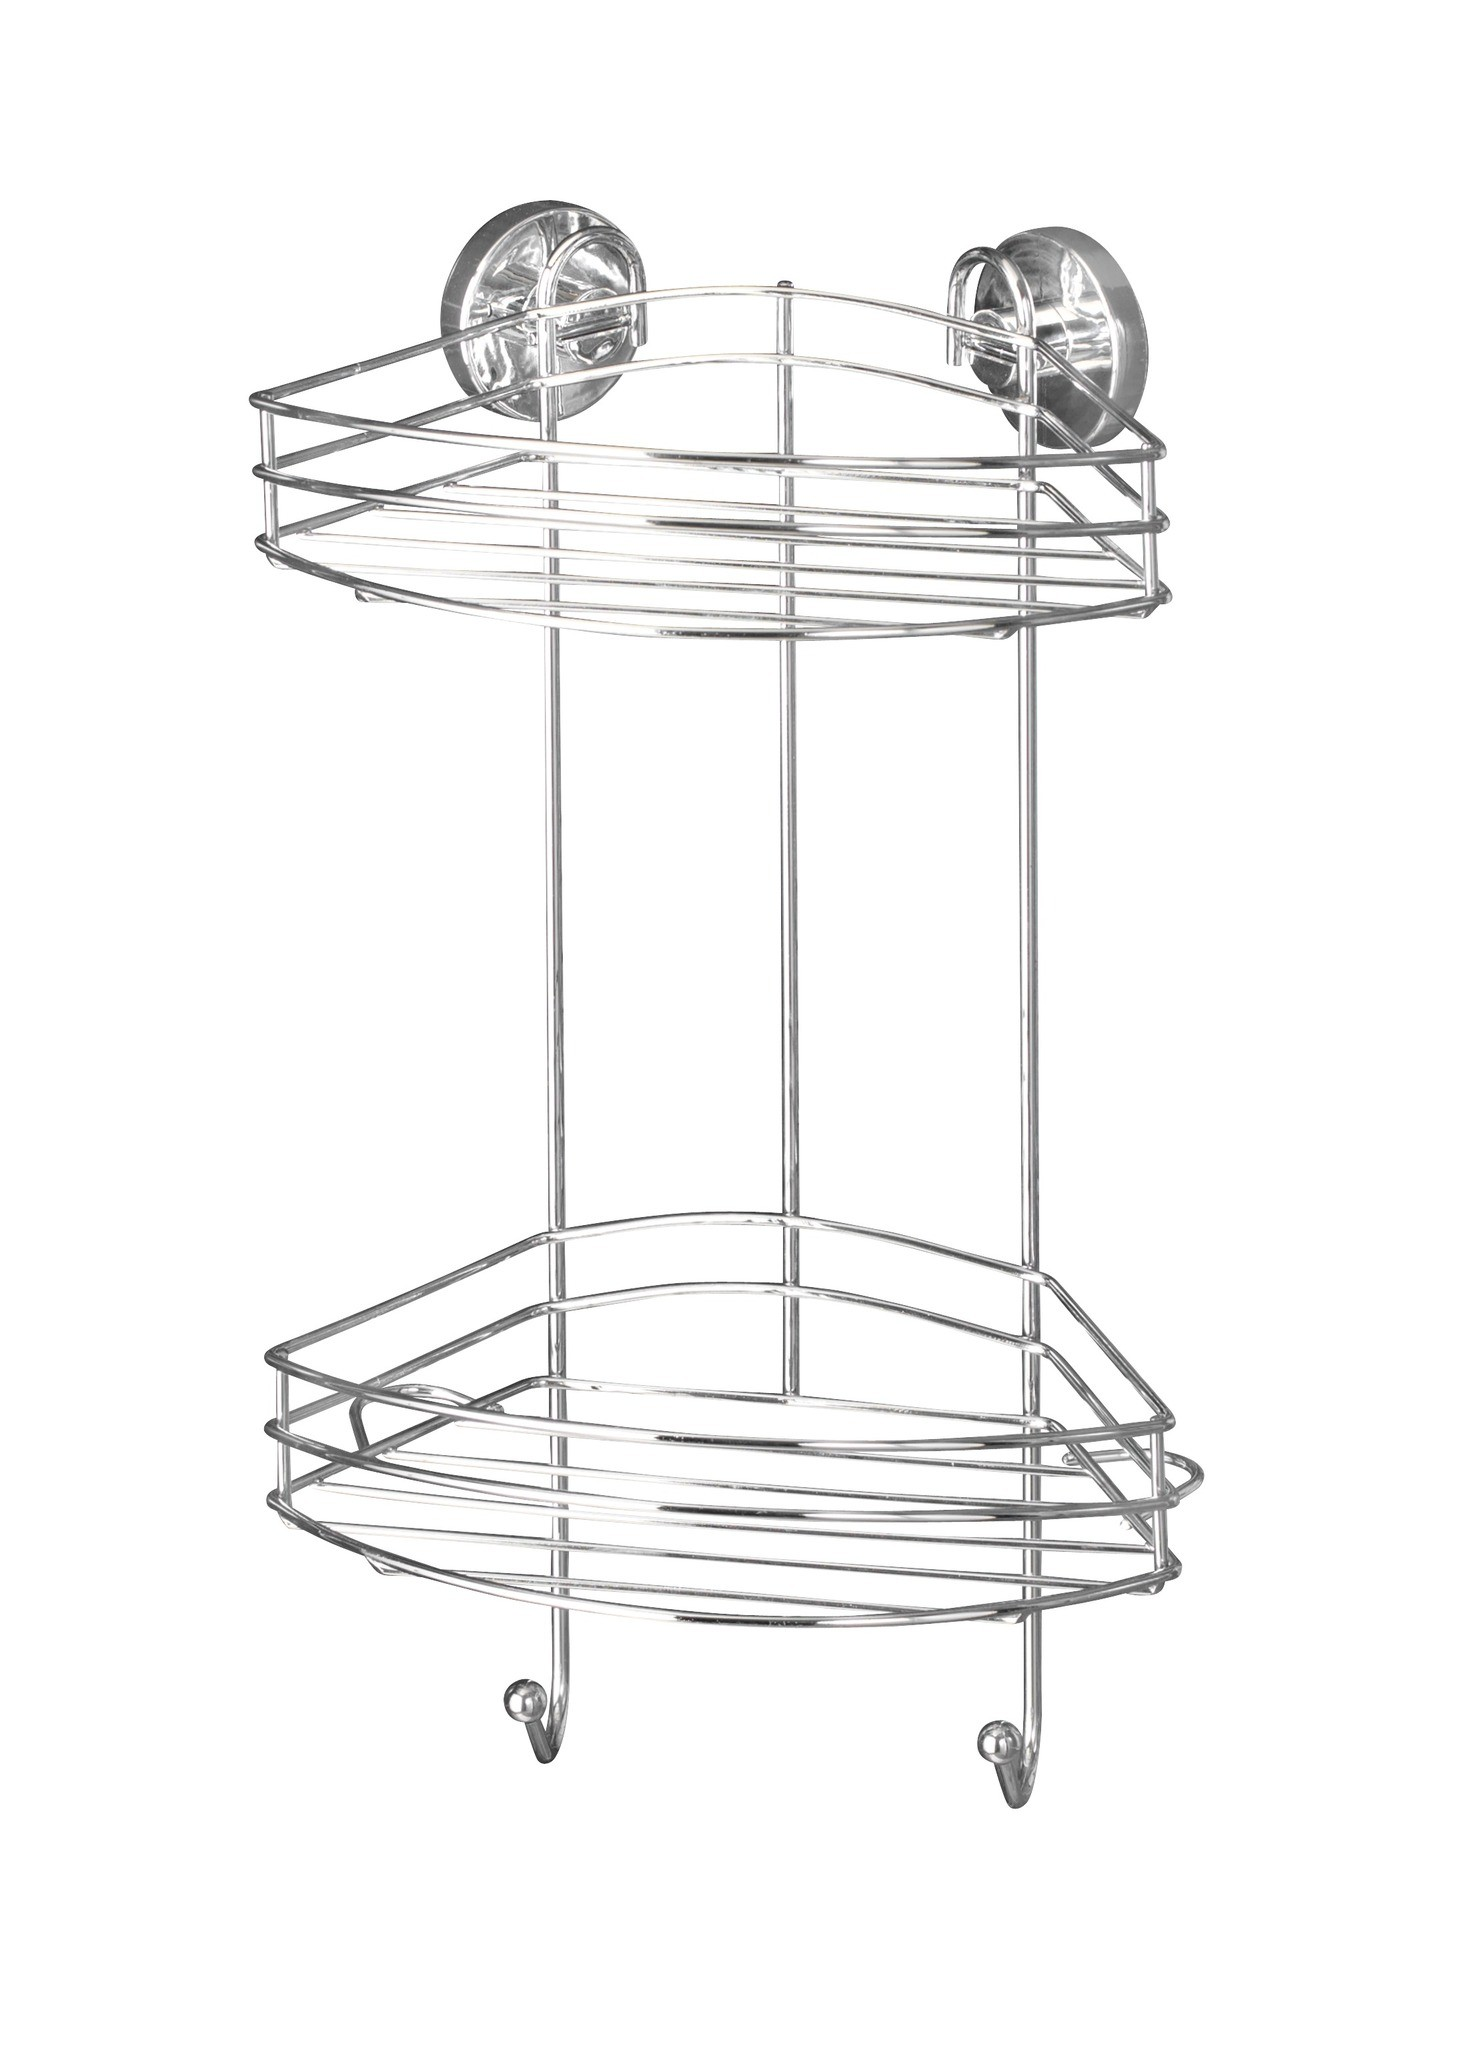 Wenko Vacuum-Loc Eckregal 2 Etagen, Befestigen ohne bohren